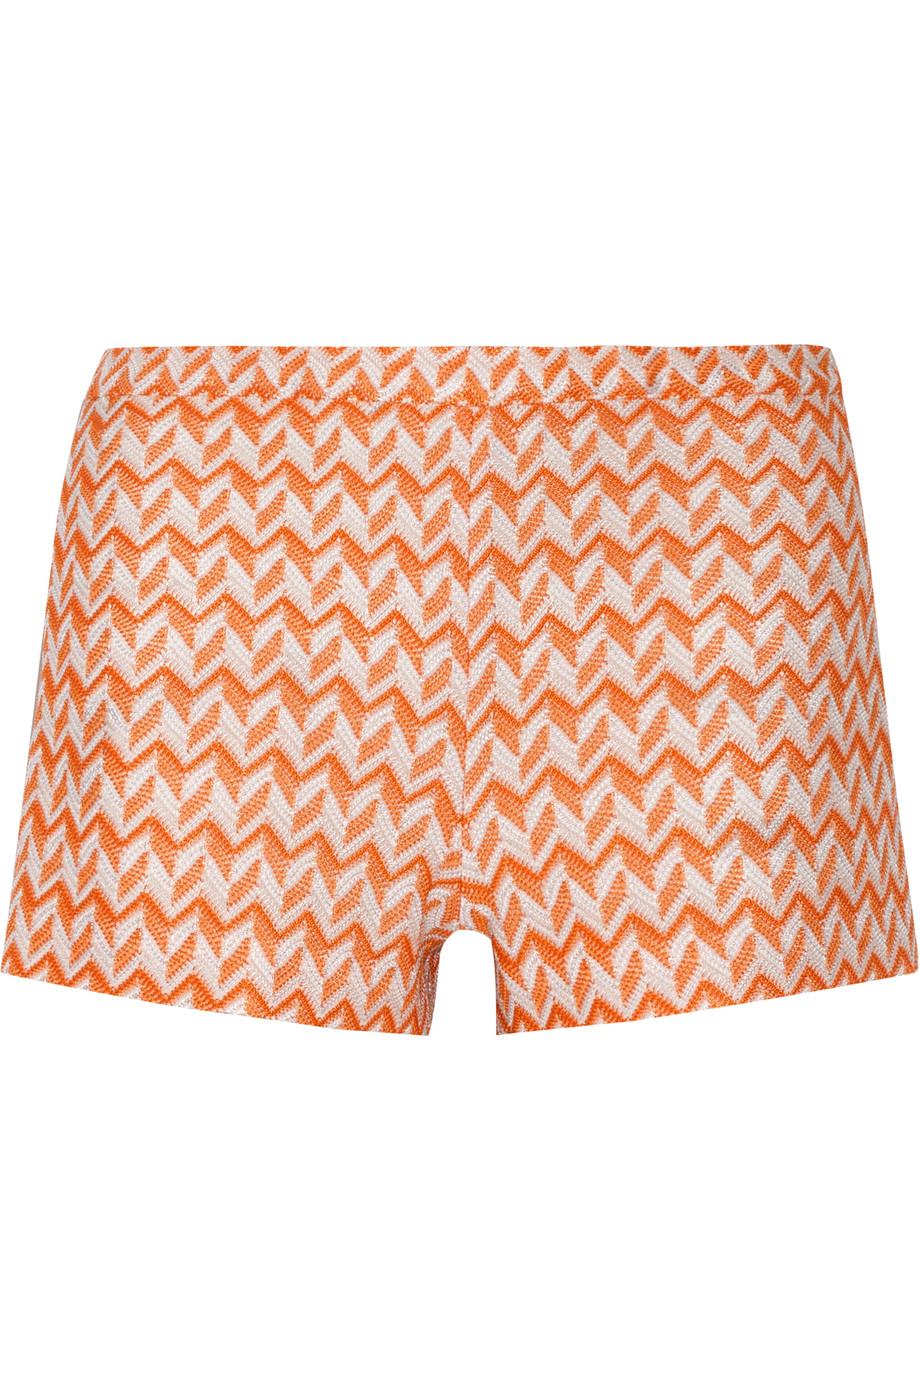 Missoni Crochet-Knit Shorts, Orange, Women's, Size: 36